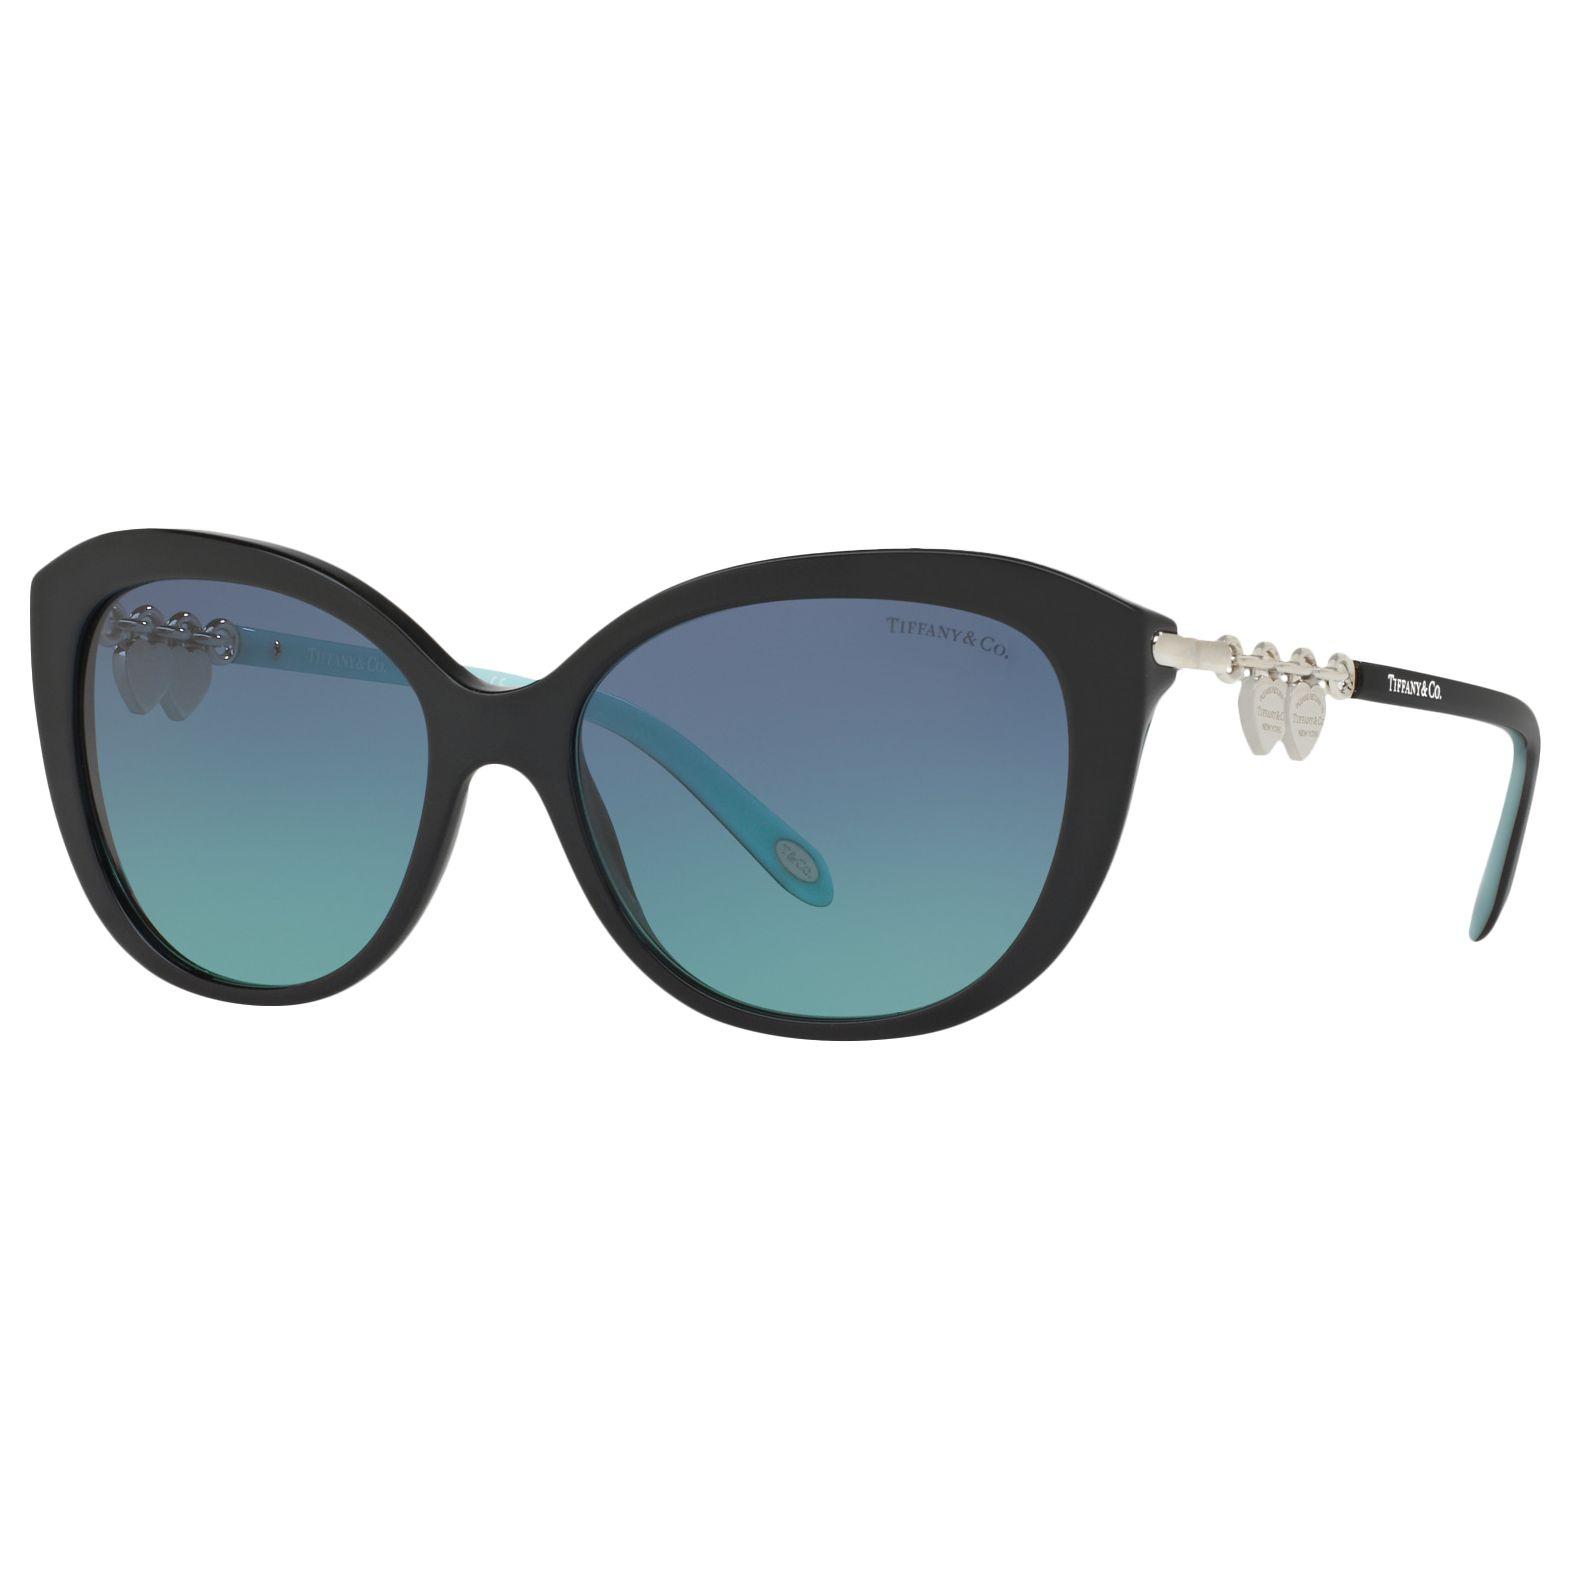 Tiffany & Co Tiffany & Co TF4130 Cat's Eye Sunglasses, Matte Black/Blue Gradient